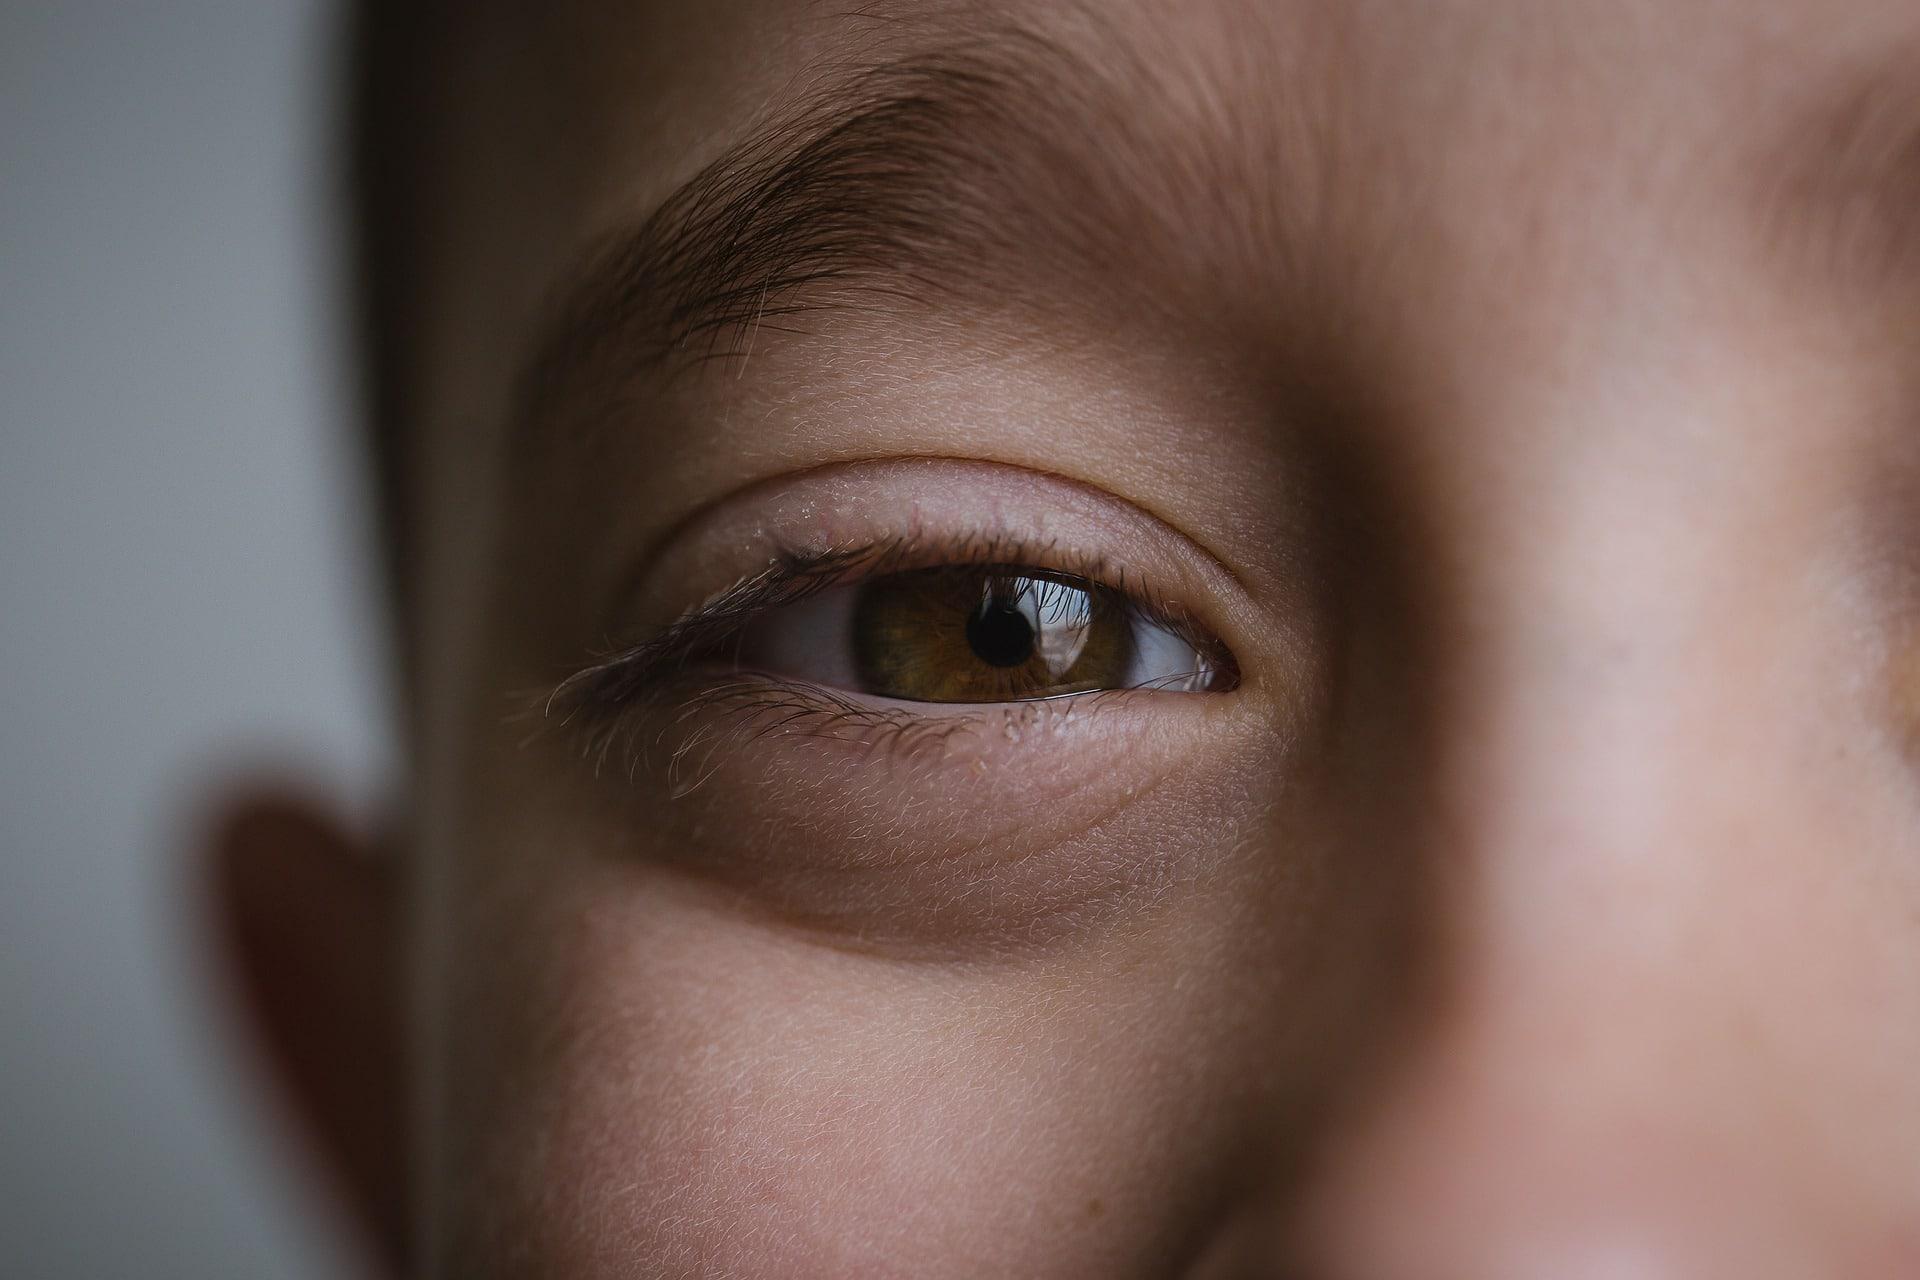 occhio pigro nei bambini